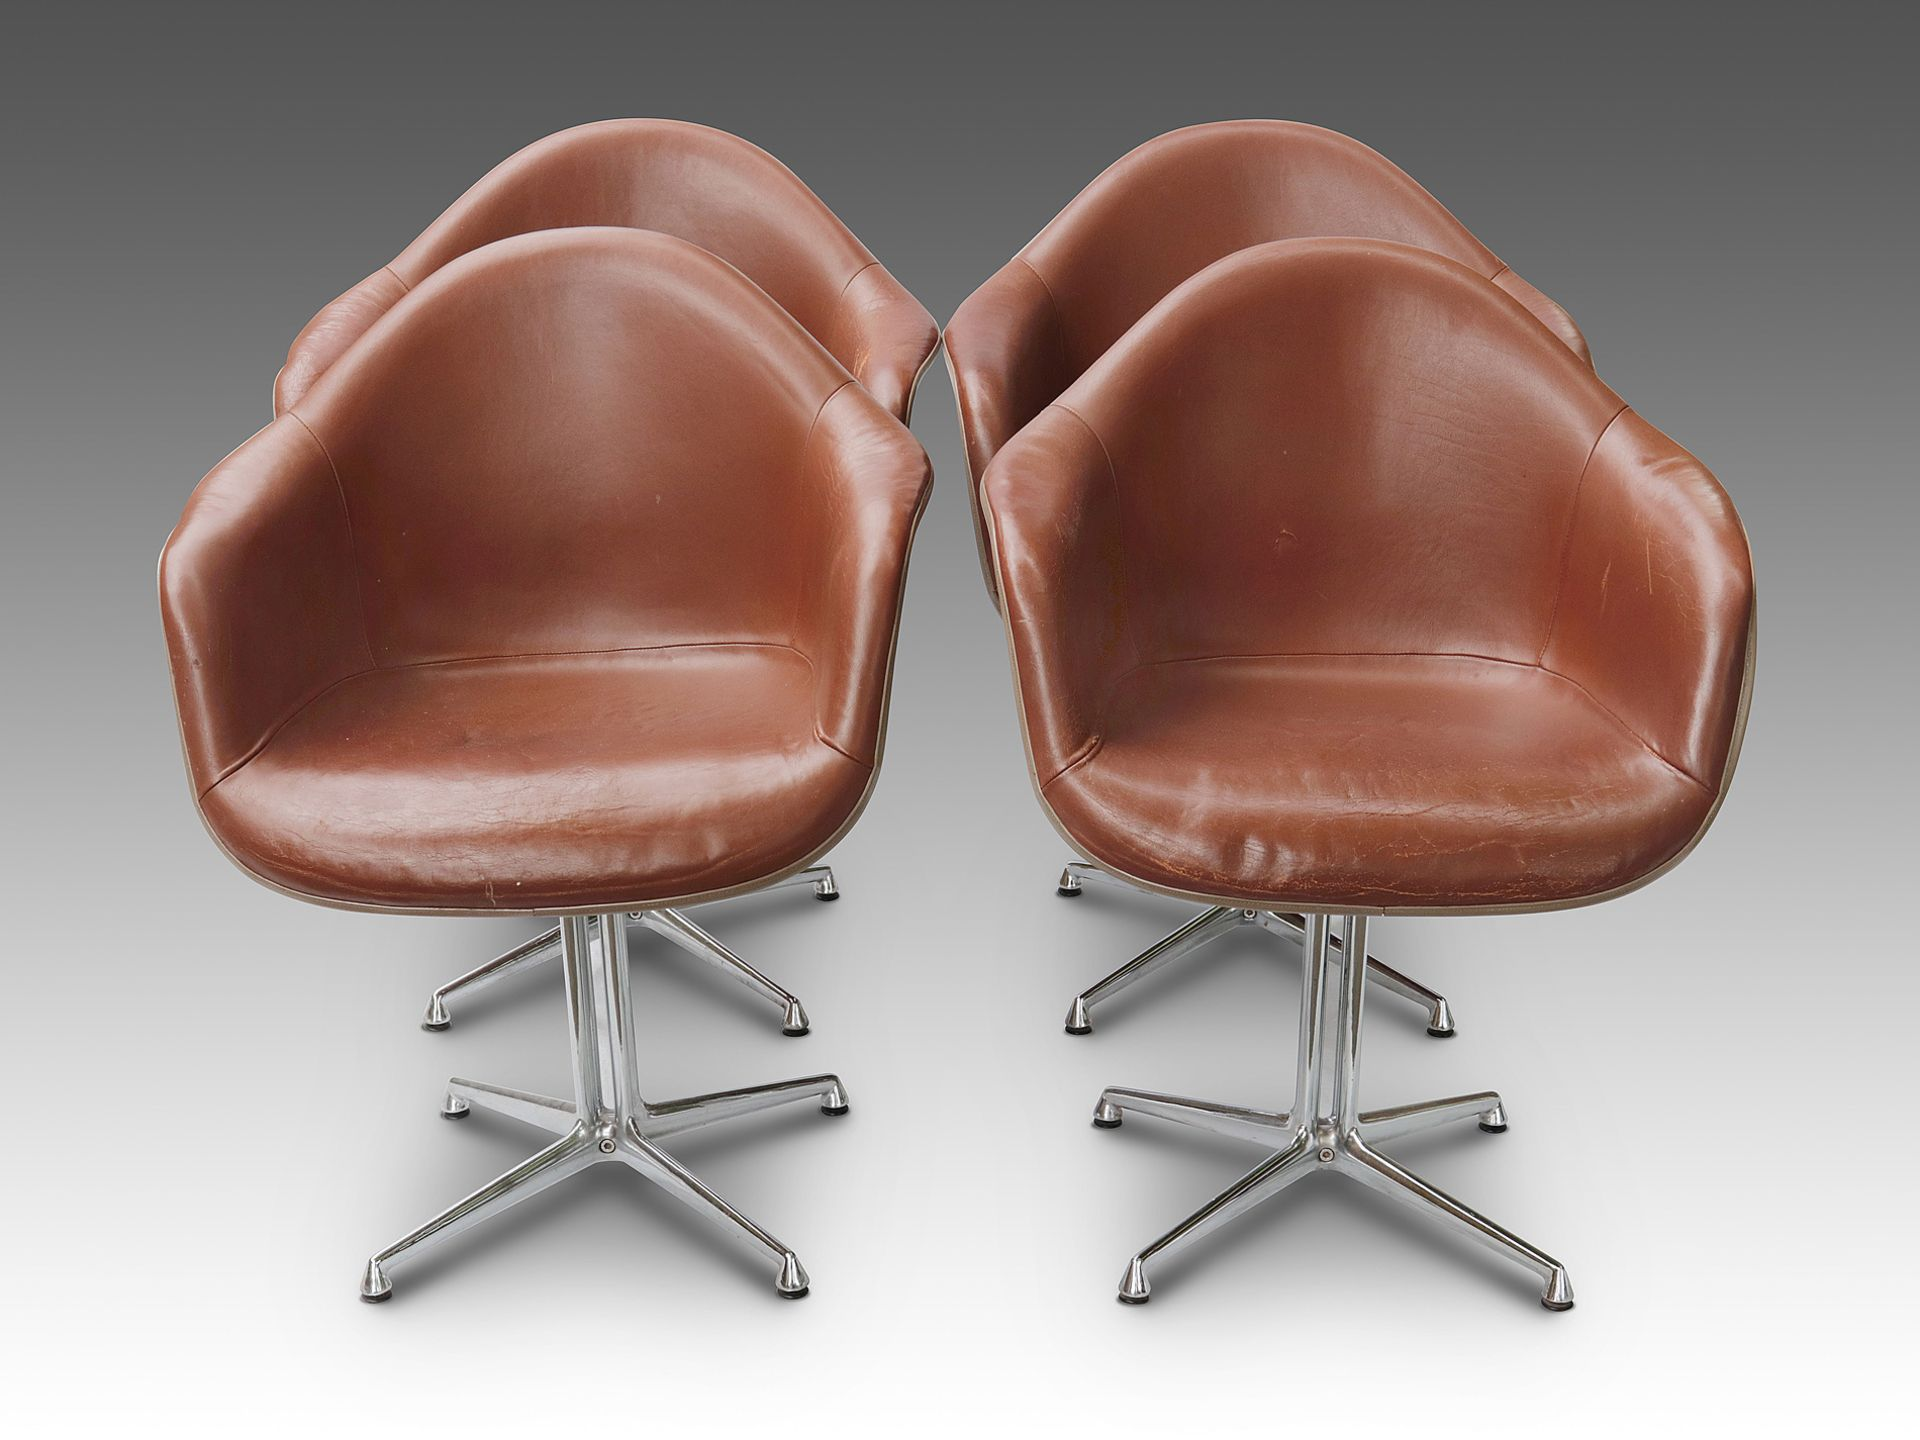 Eames-Schalensessel - 8er Satz - Image 2 of 9